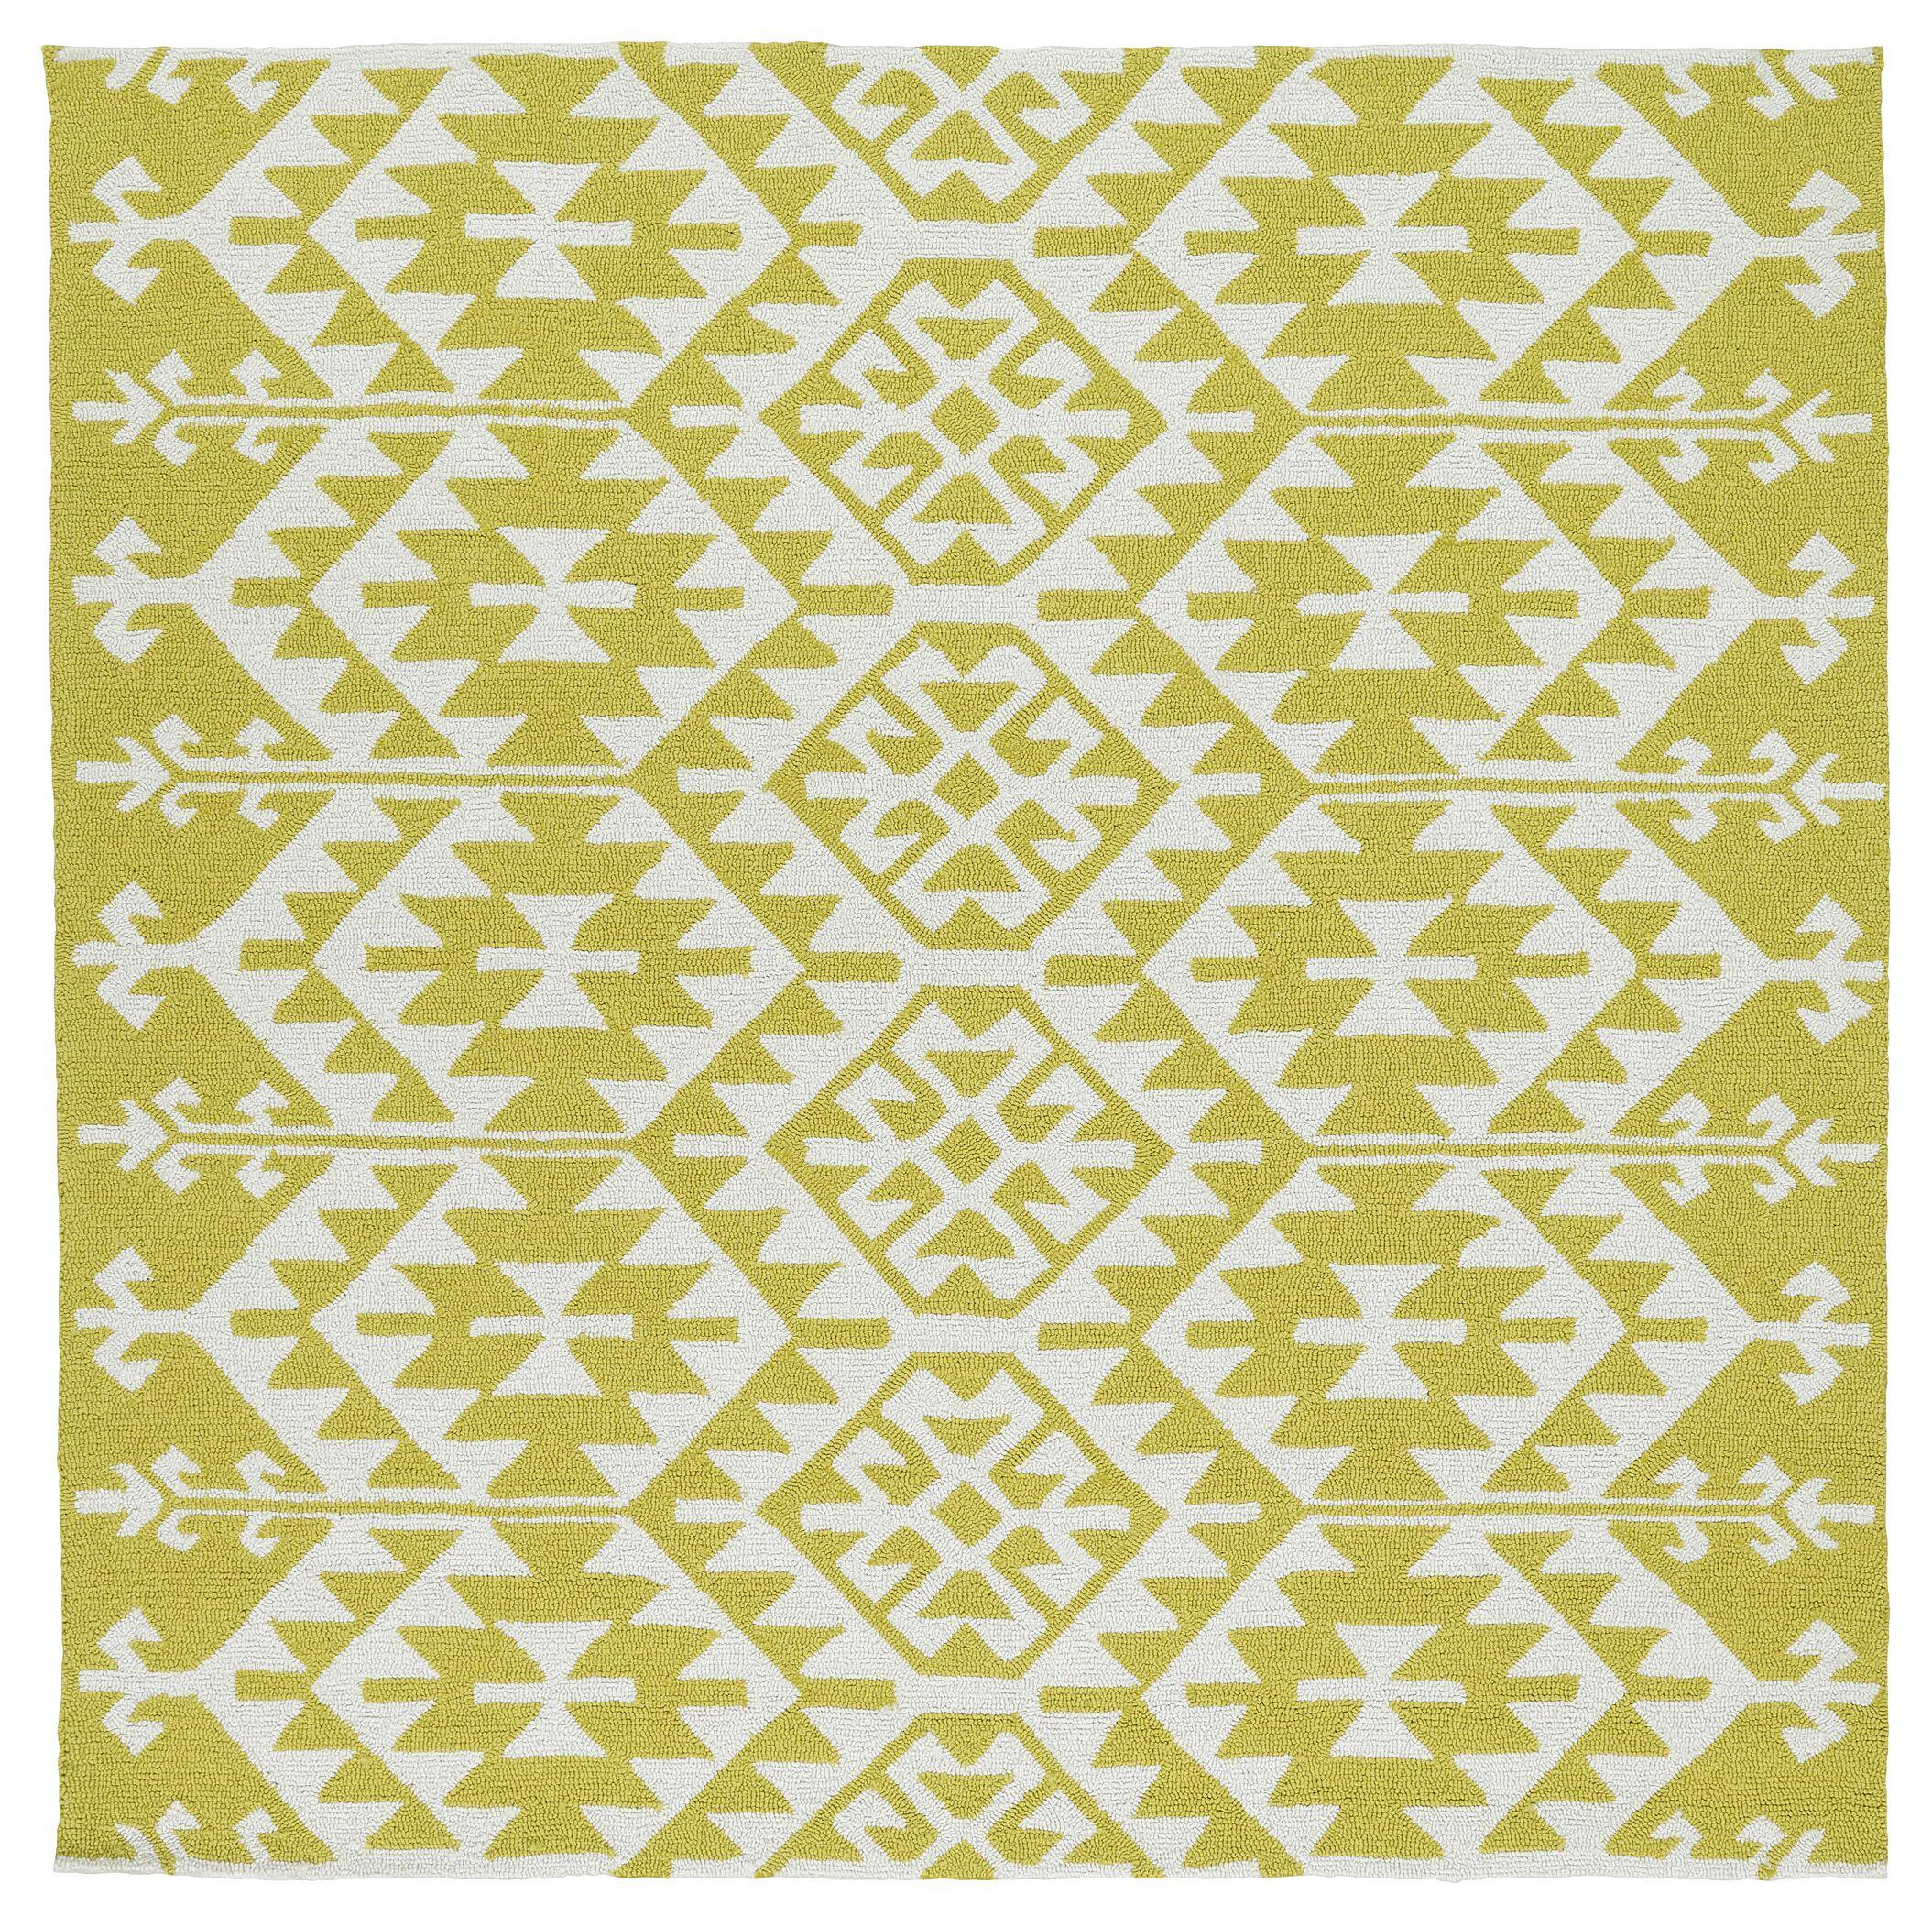 Handmade Wasabi/Ivory Indoor/Outdoor Area Rug Rug Size: Square 7'9